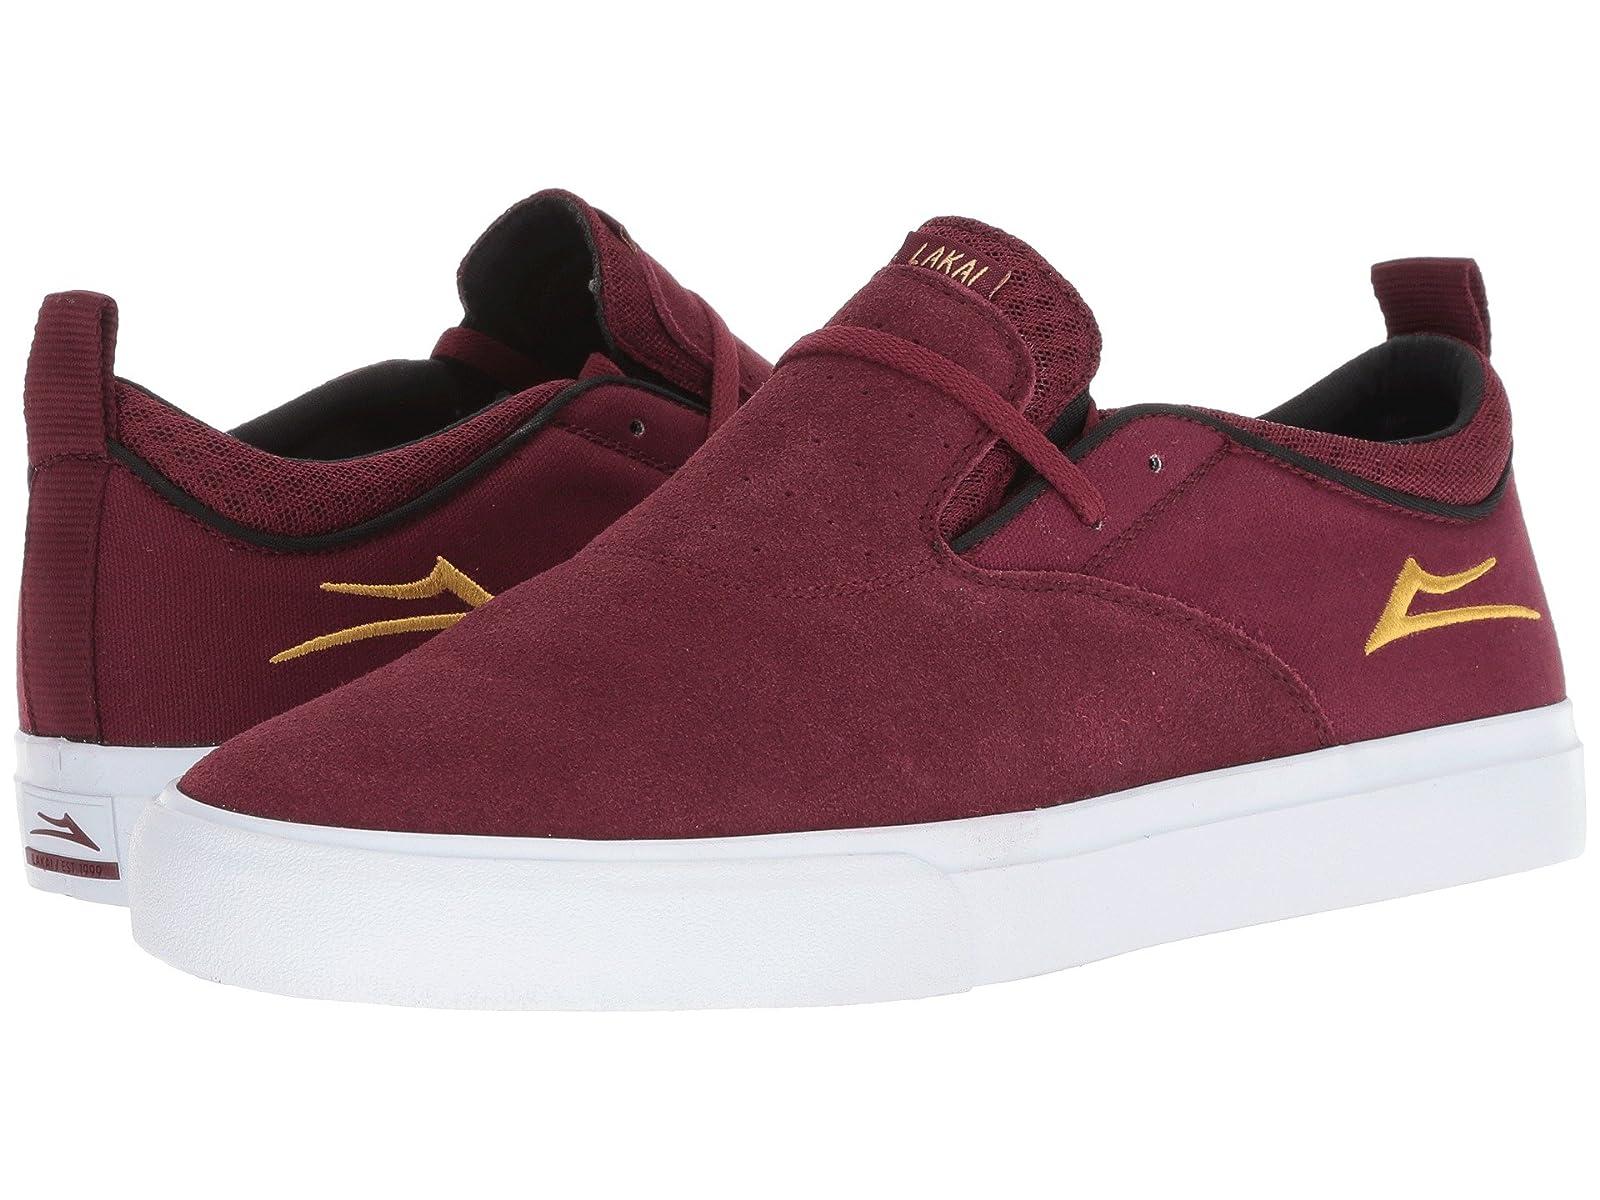 Lakai Riley Hawk 2Atmospheric grades have affordable shoes